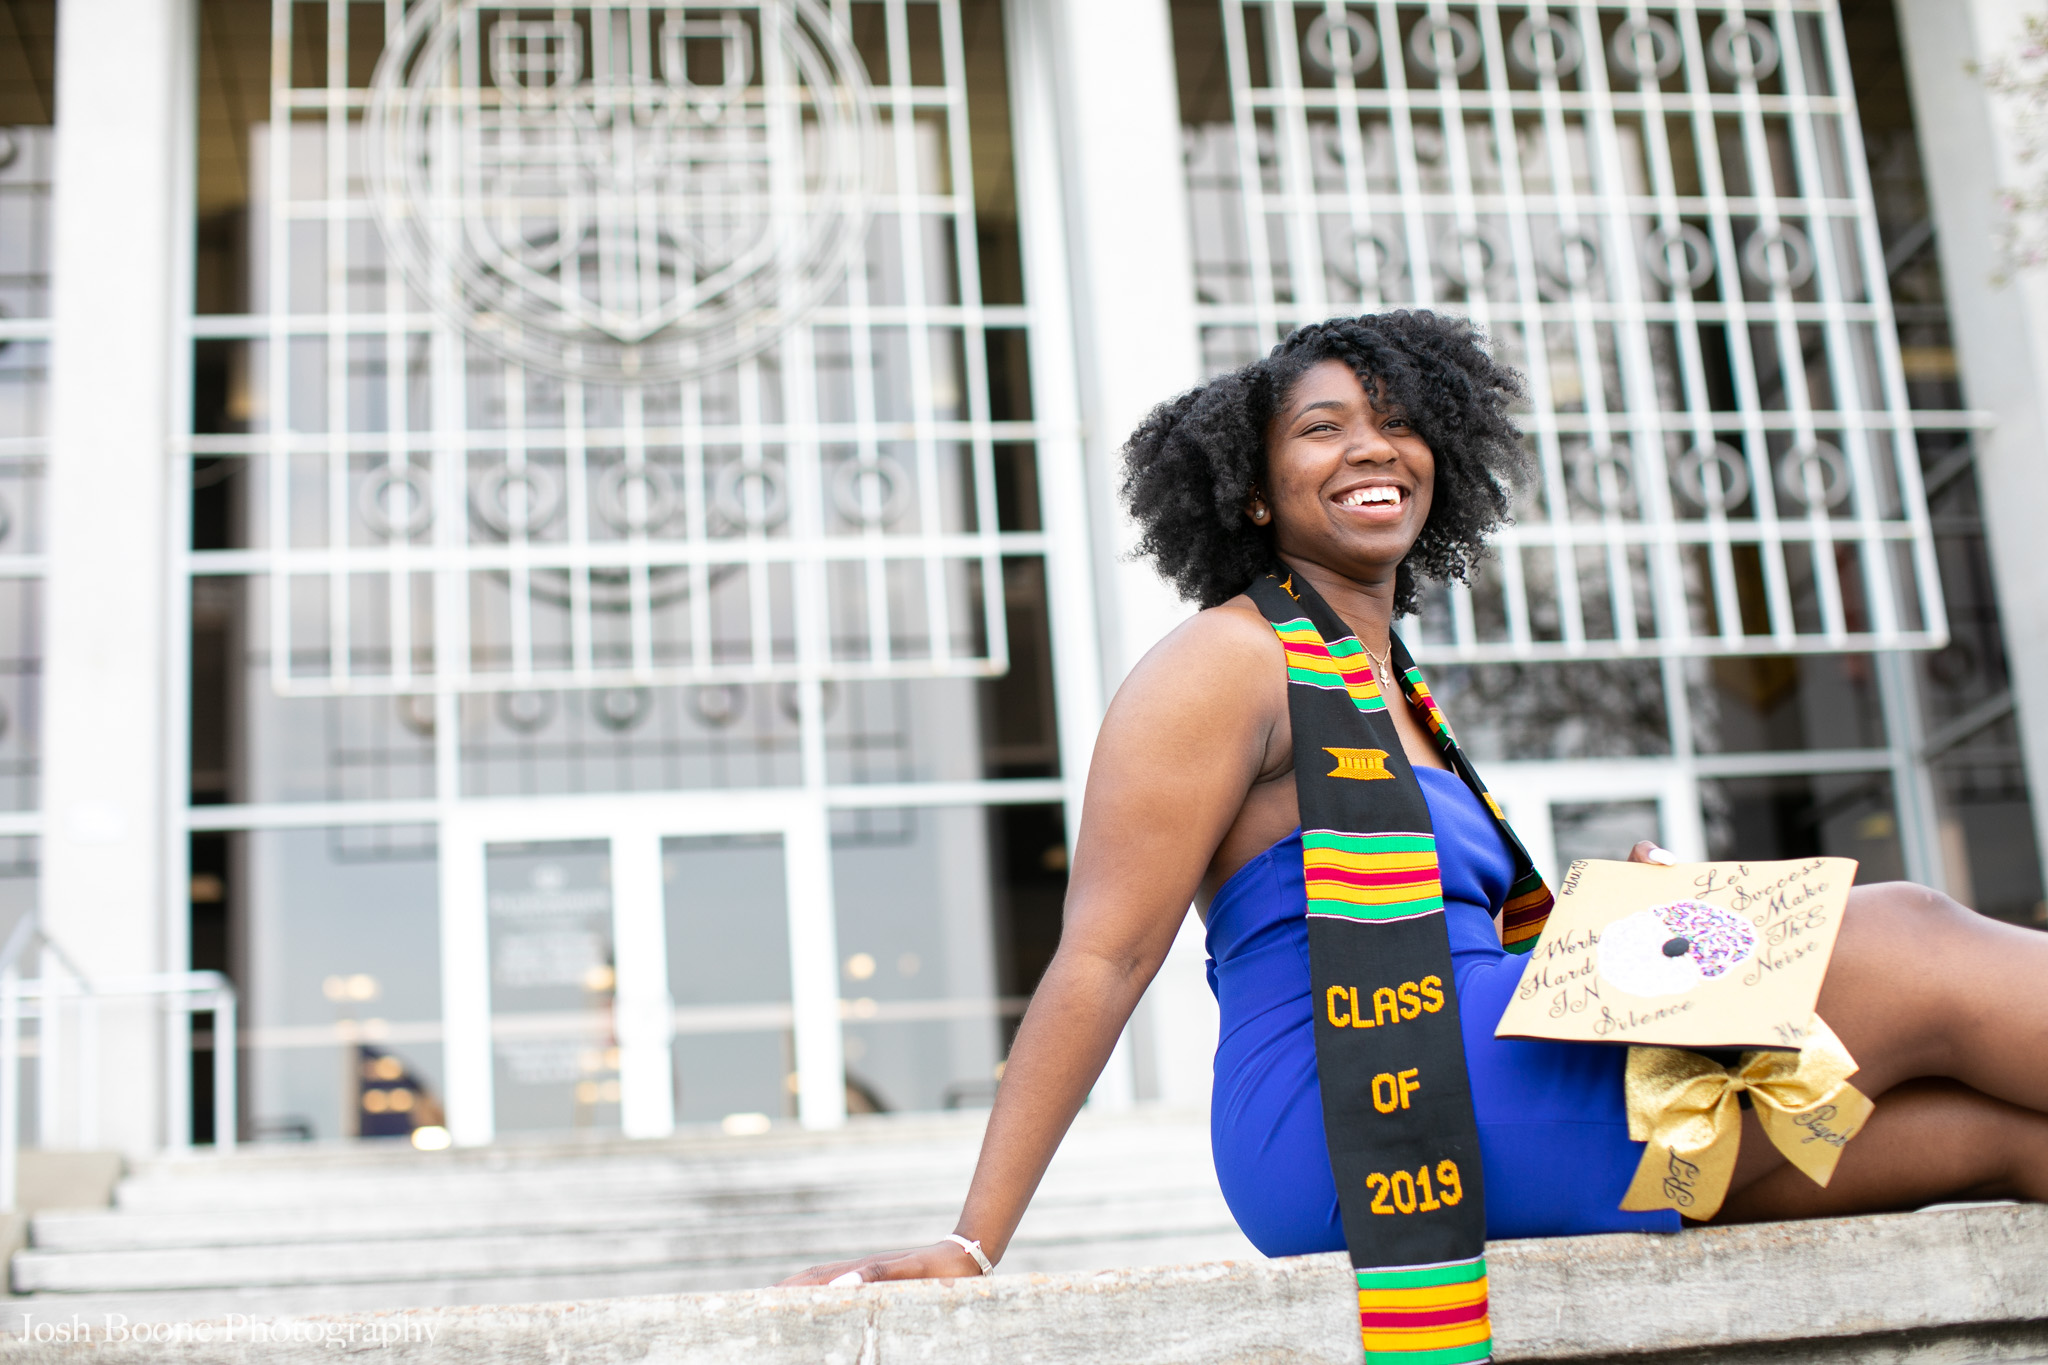 old_dominion_university_graduation_pictures-3.jpg